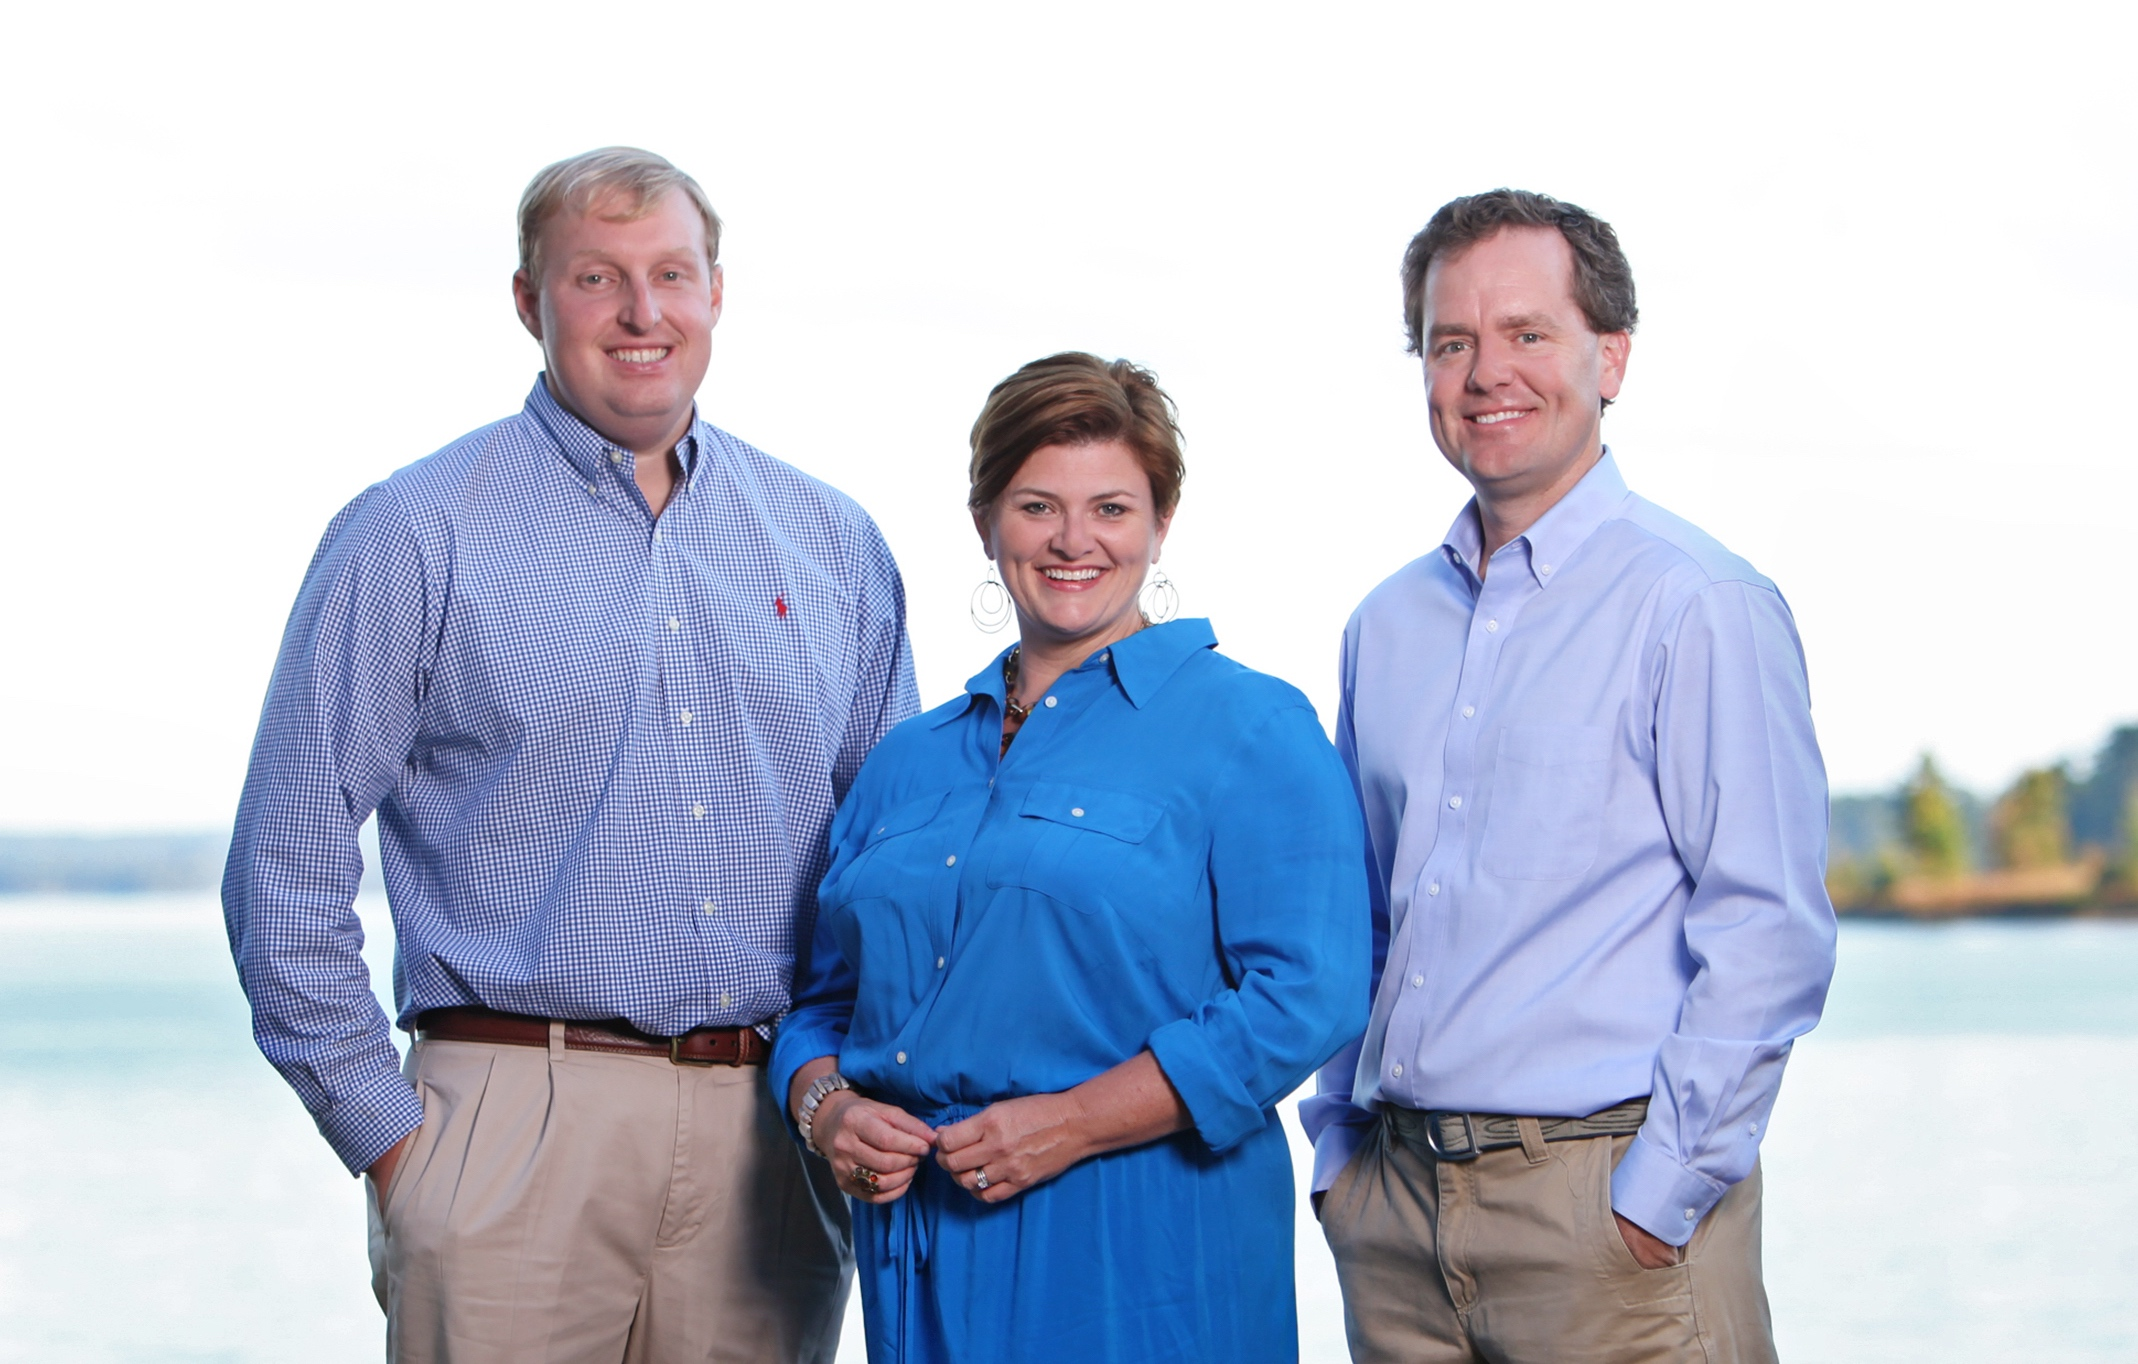 l-r: John Christenberry, Agent; Paige Patterson, Agent; John Coley, Agent / Broker / Owner